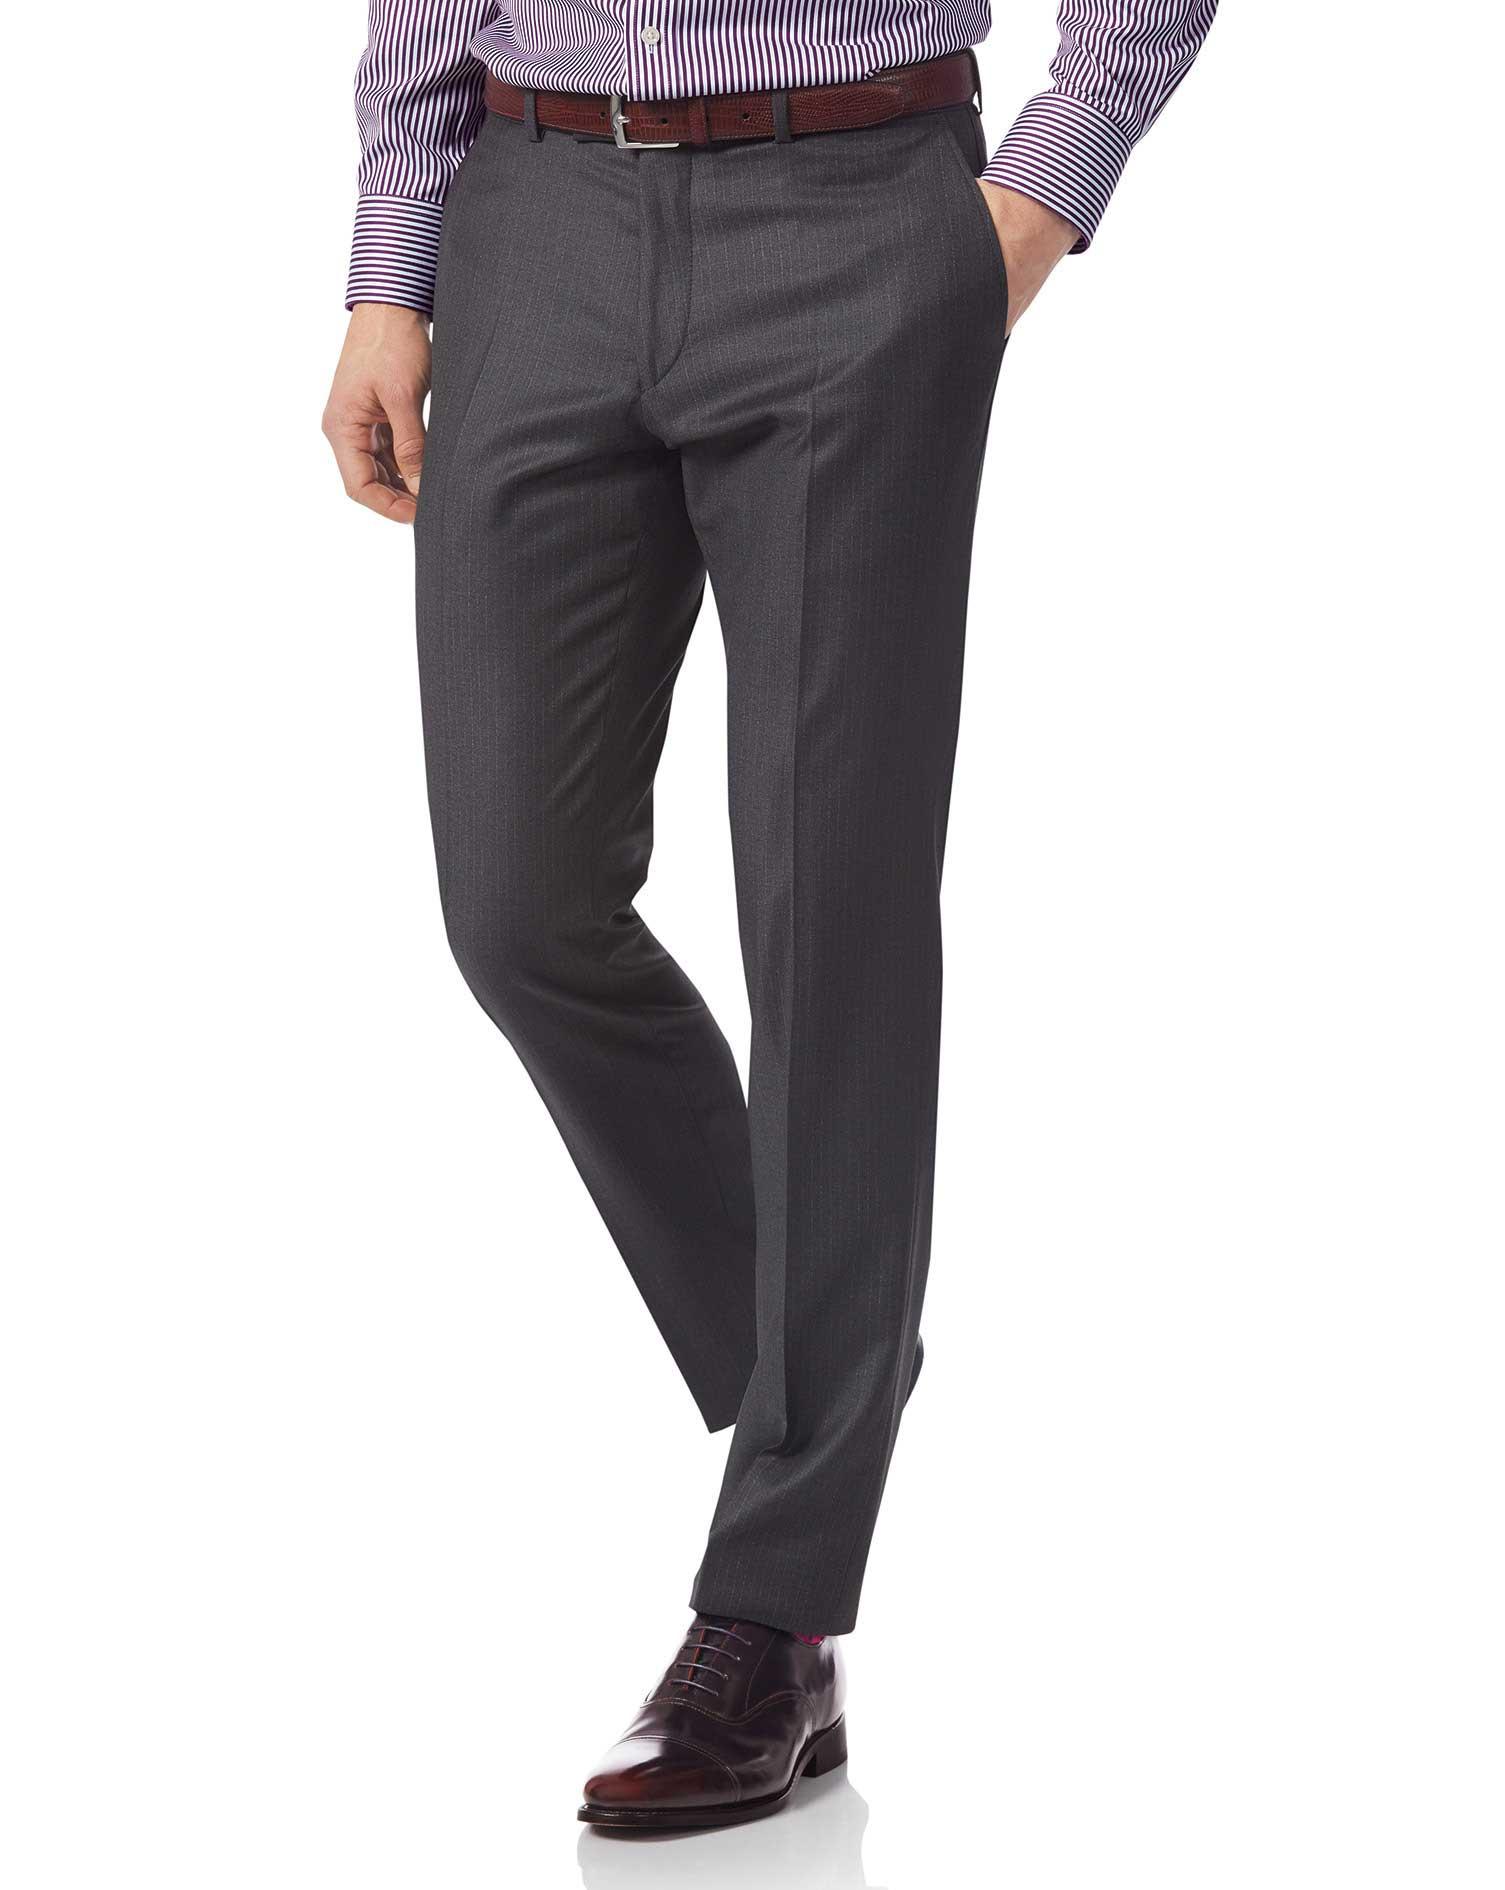 Grey Slim Fit Italian Stripe Suit Trousers Size W34 L38 by Charles Tyrwhitt